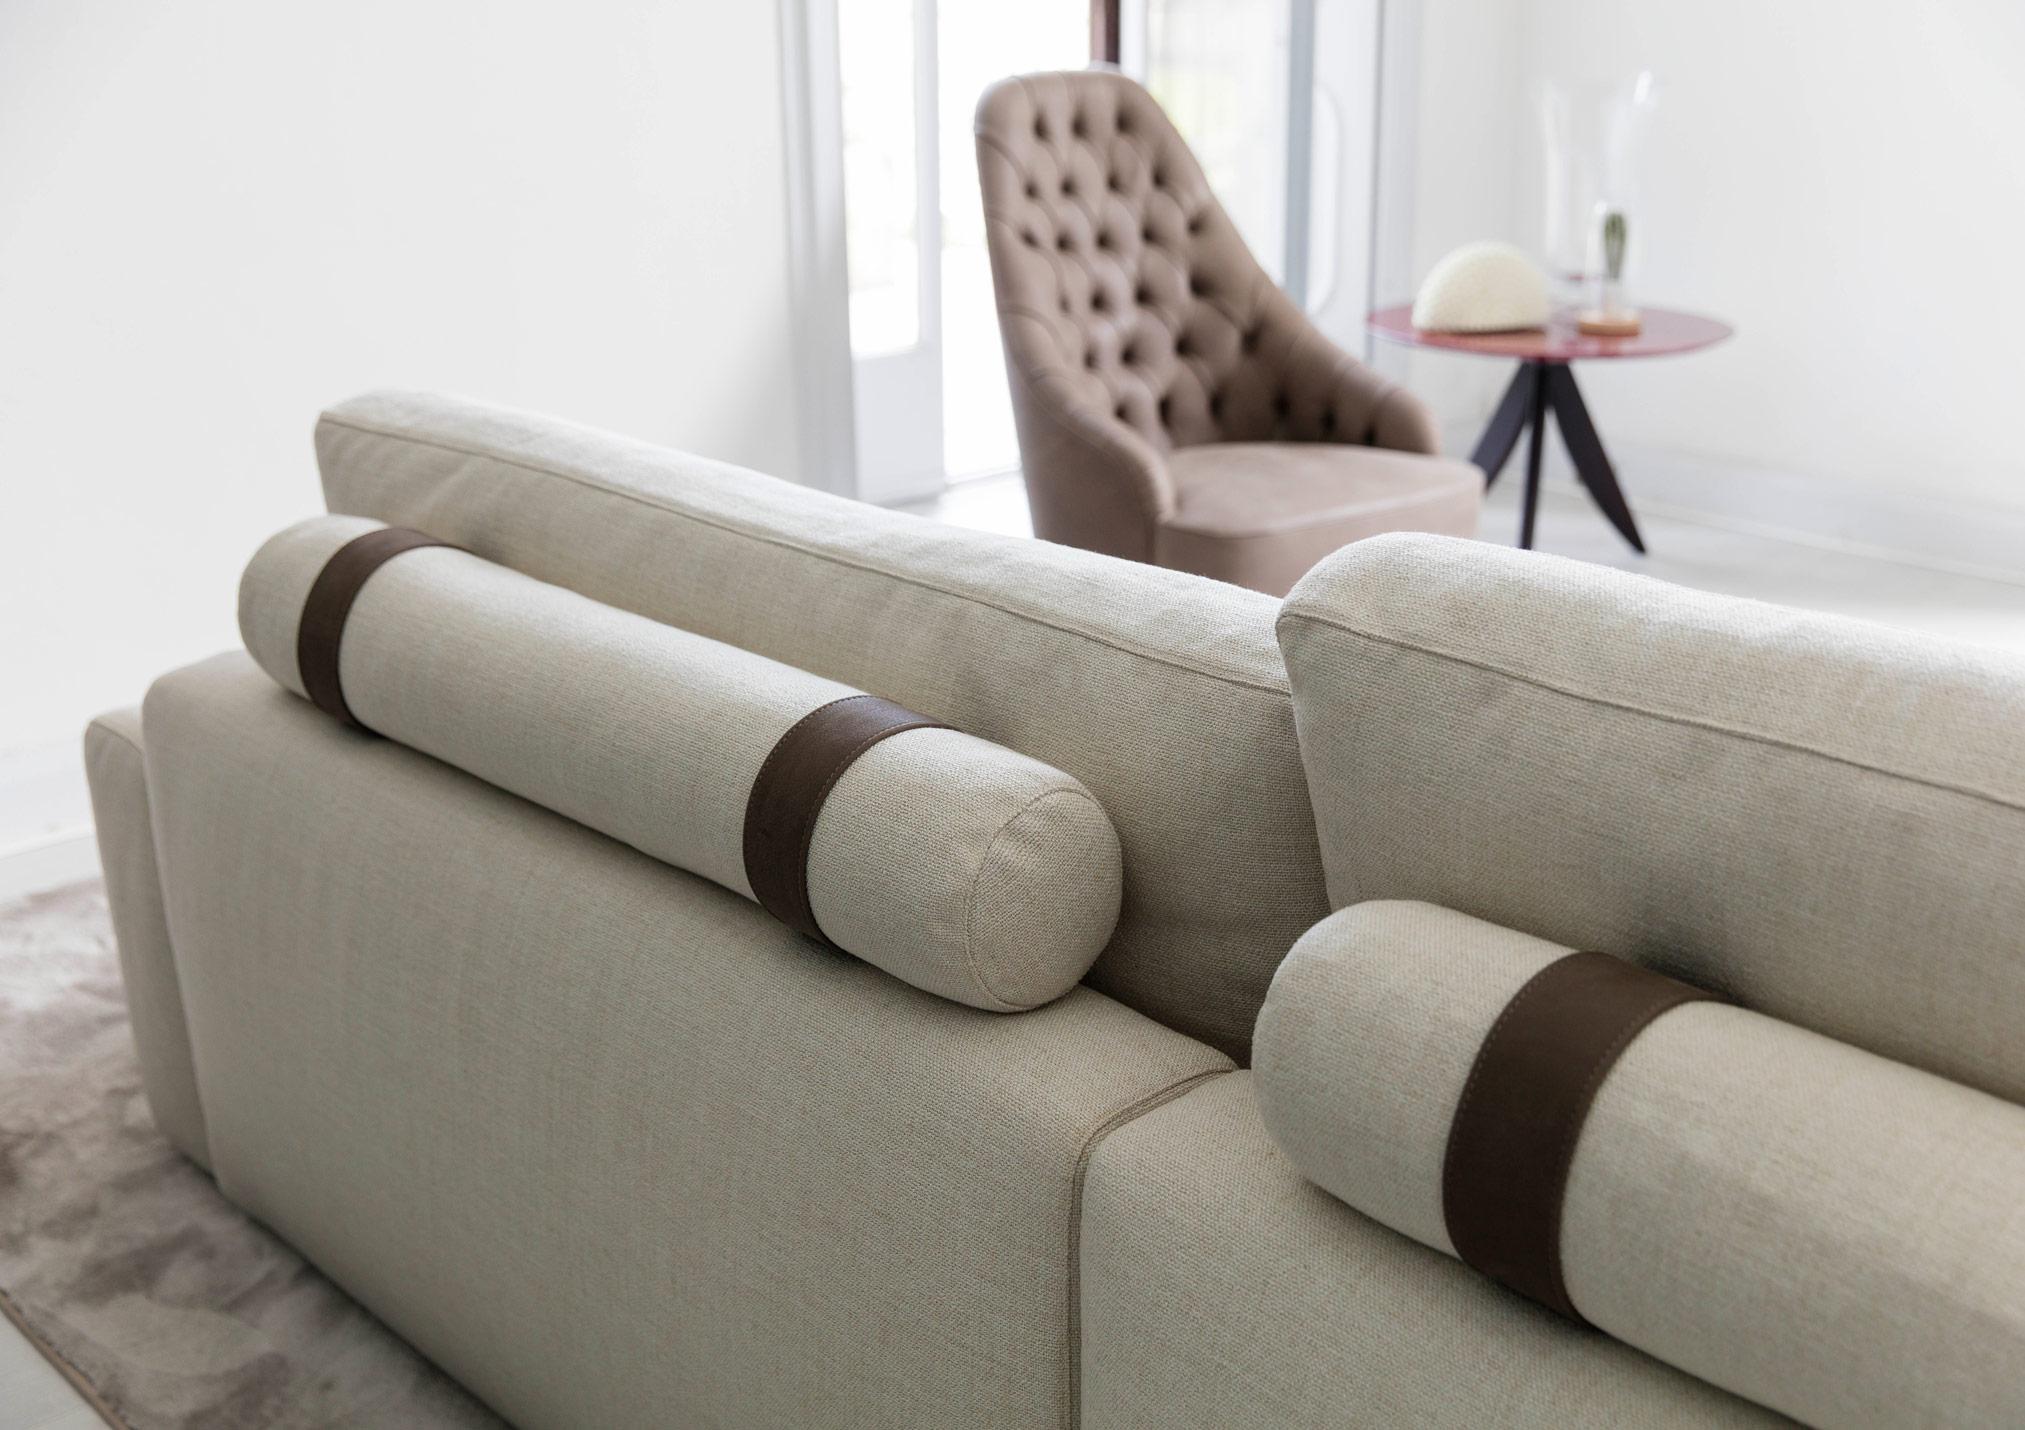 Cinghie in nabuk per schienali alti e bassi divano Joey